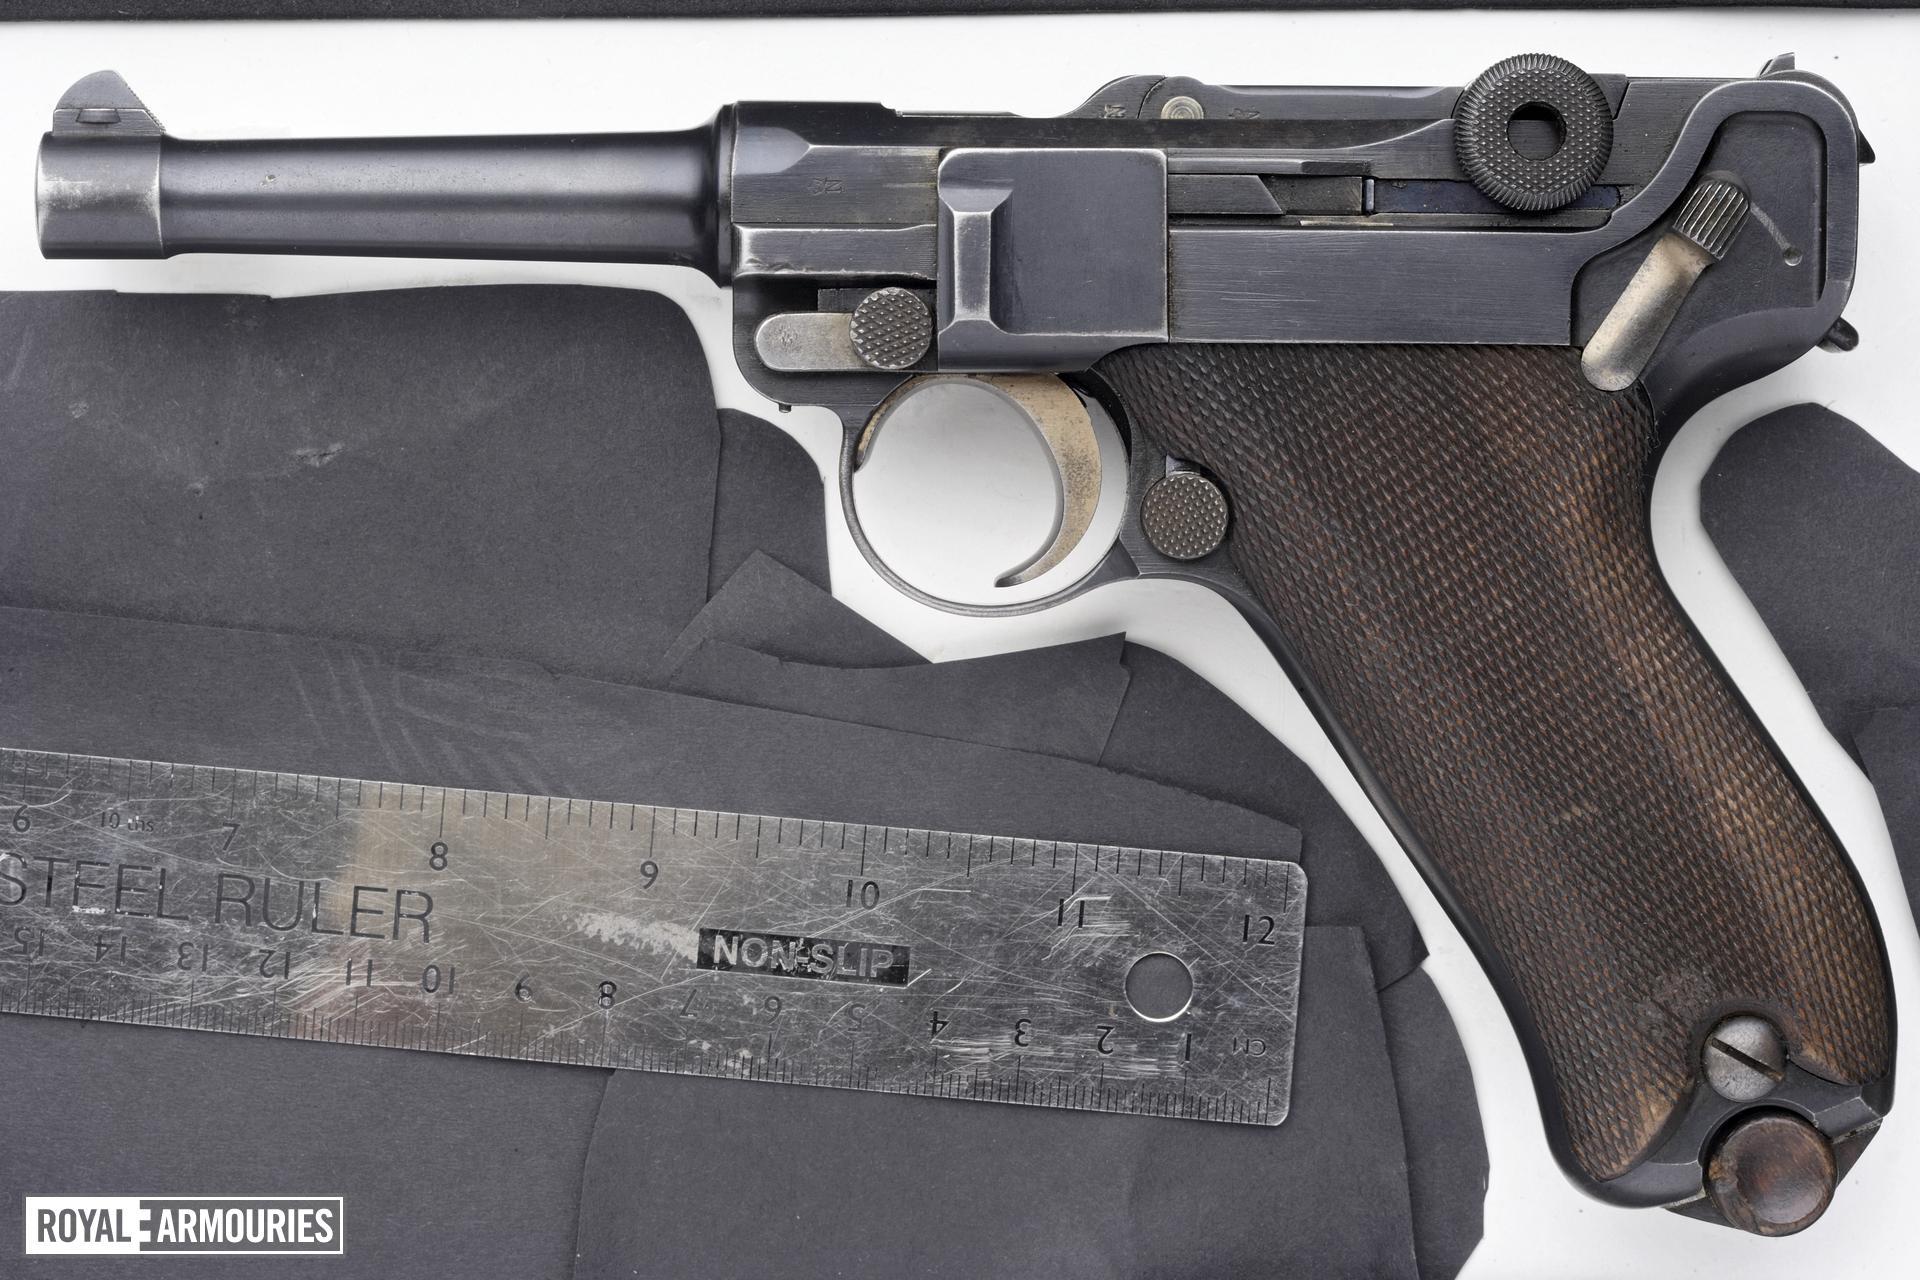 Centrefire self-loading pistol - Luger Model 1908, Commercial